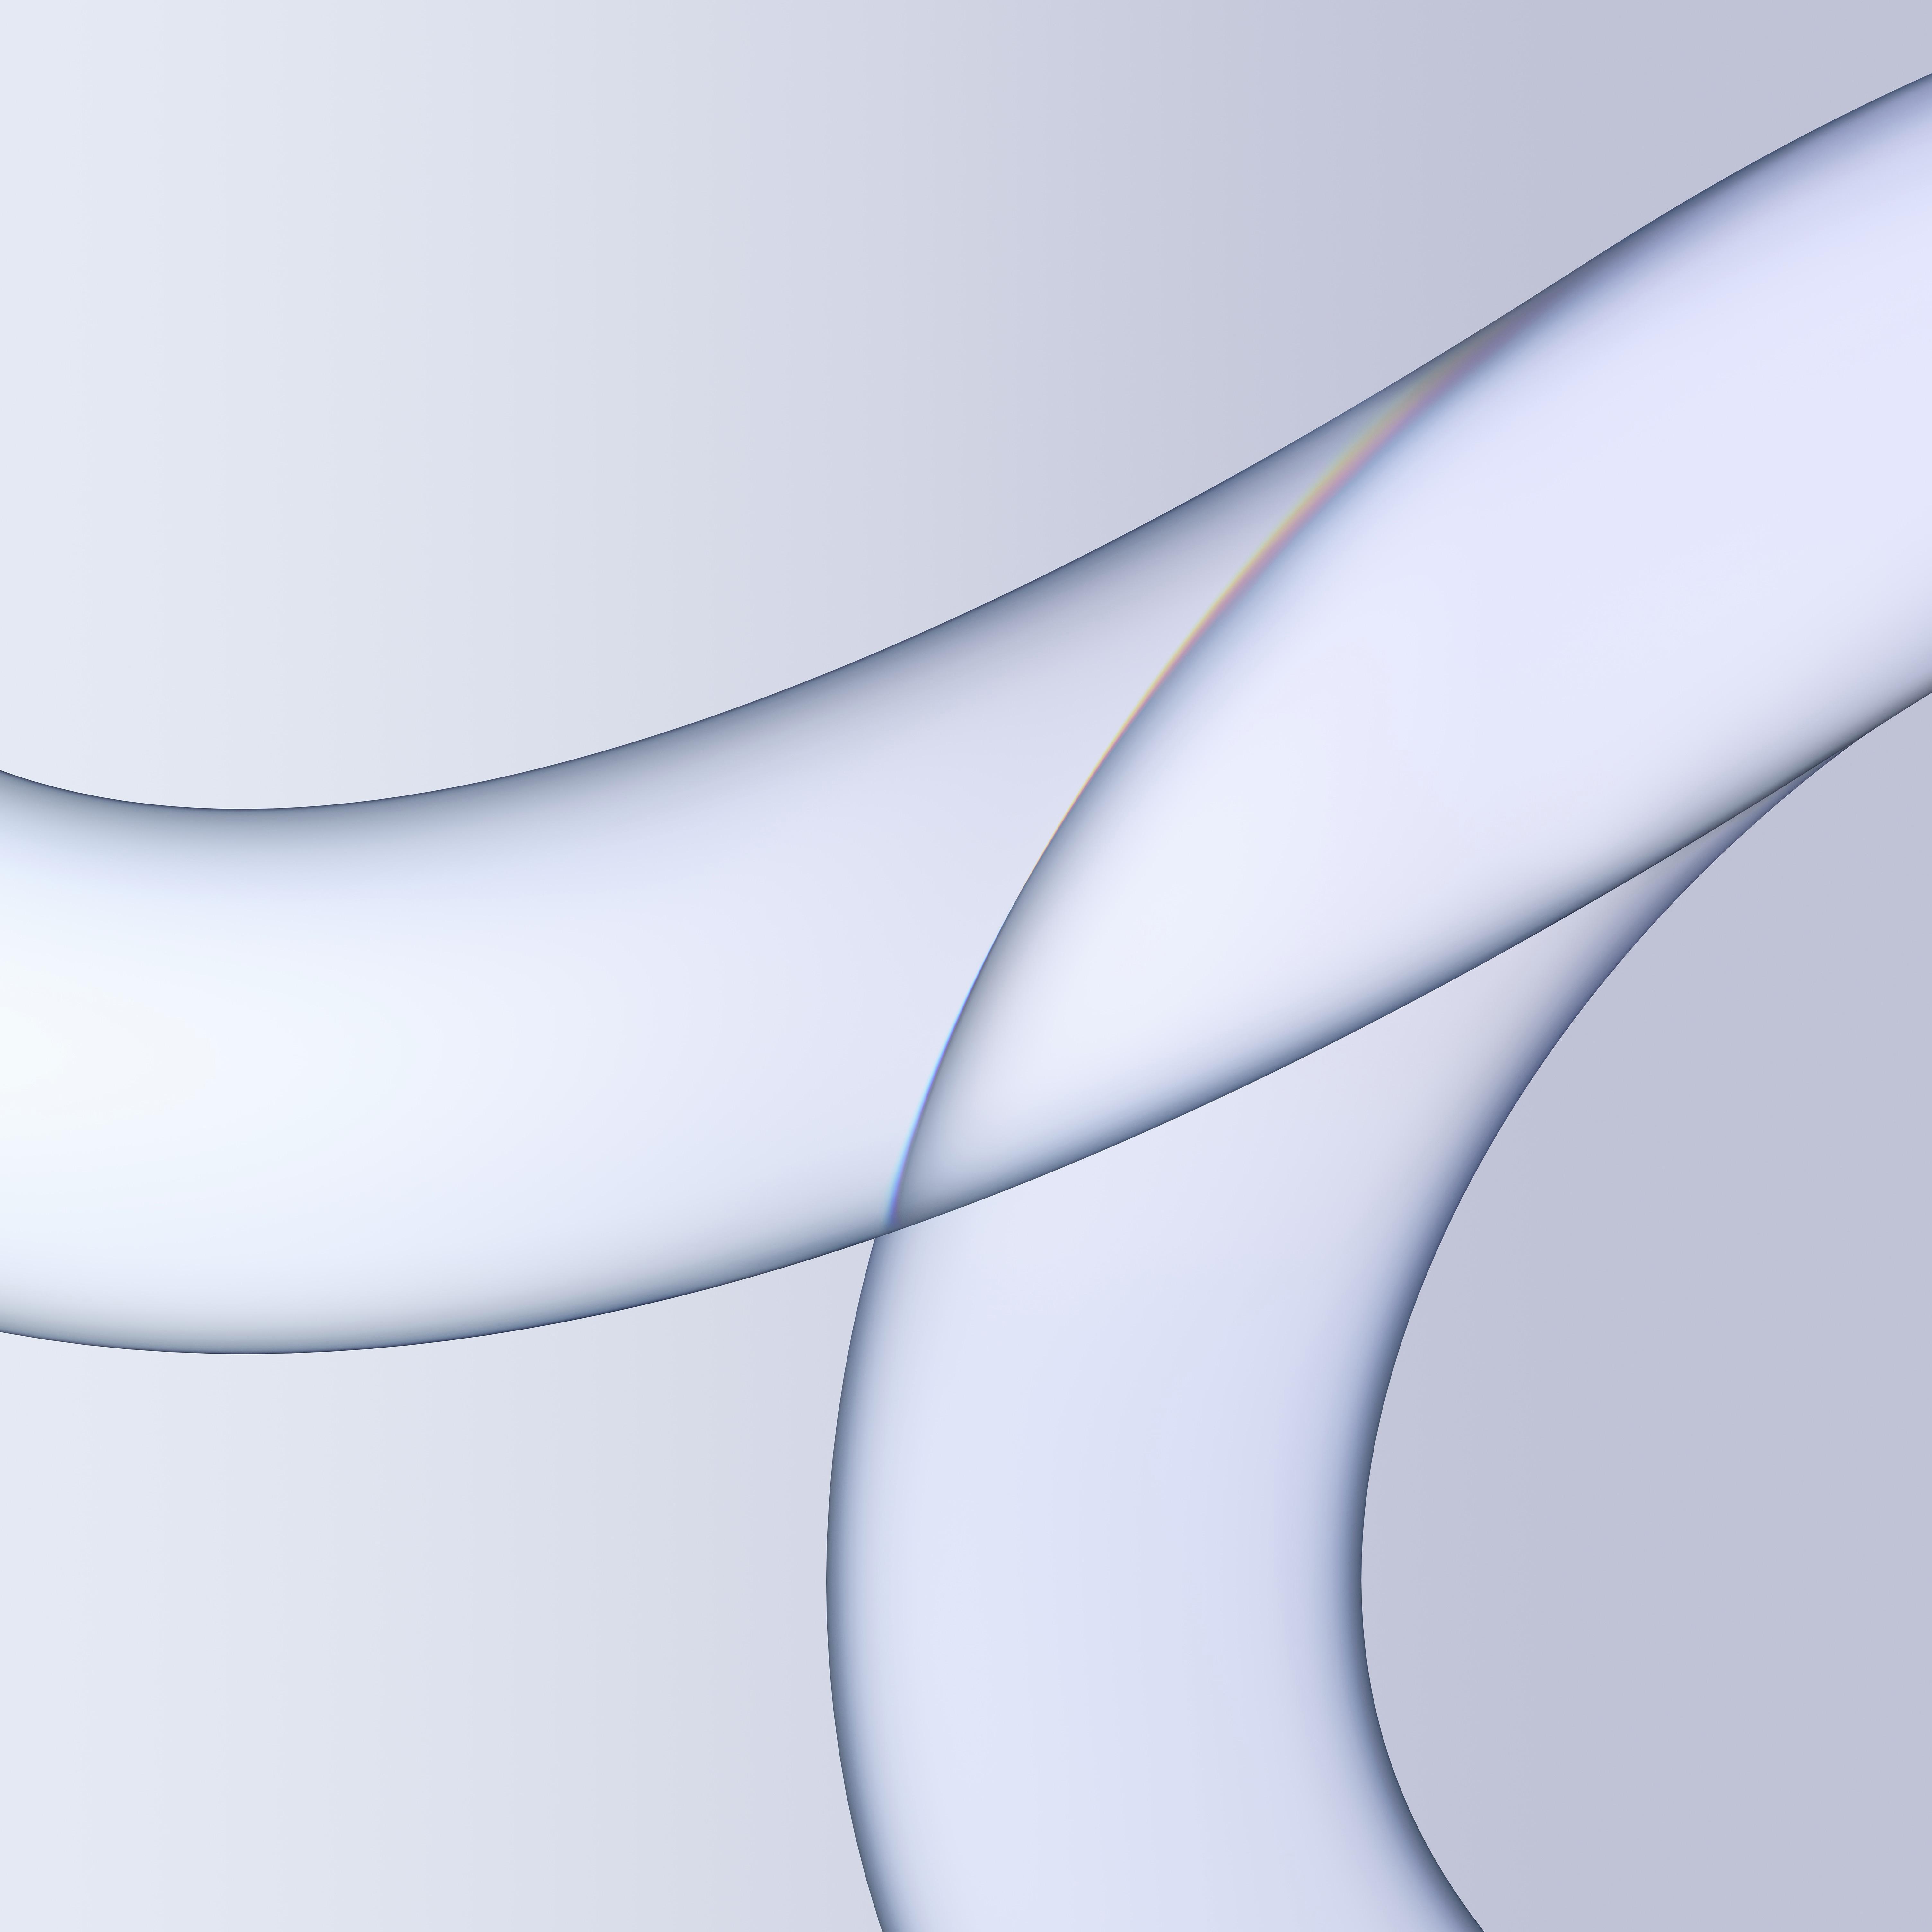 2021 iMac color matching wallpaper idownloadblog (Grey Light) @AR72014